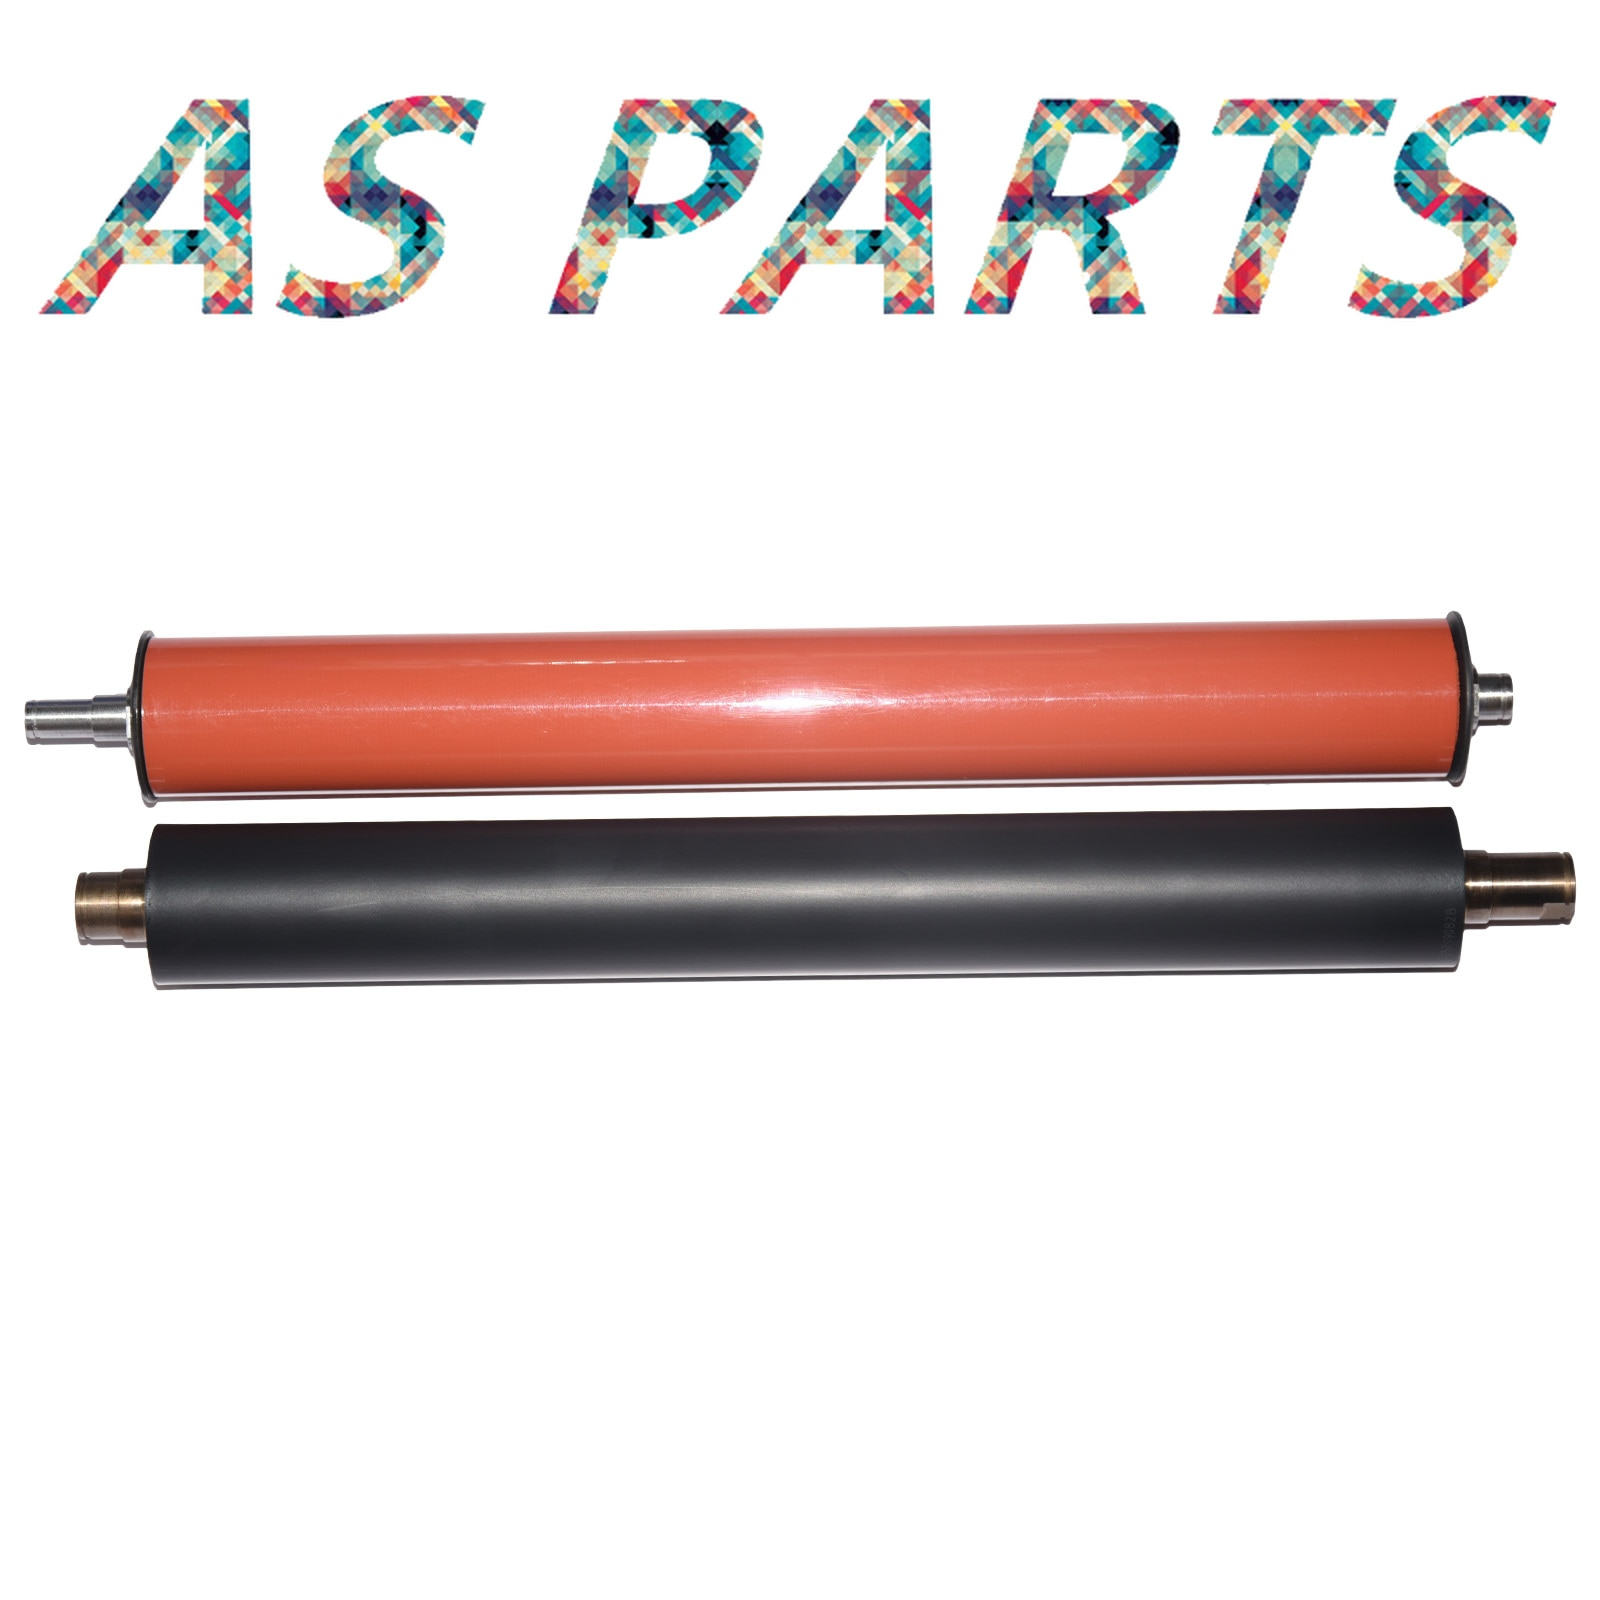 1X AE01-0079 AE010079 العلوي فوزر الحرارة الأسطوانة لريكو MP C4501 C5501 MPC4501 MPC5501 4501 5501 أقل ضغط الأسطوانة